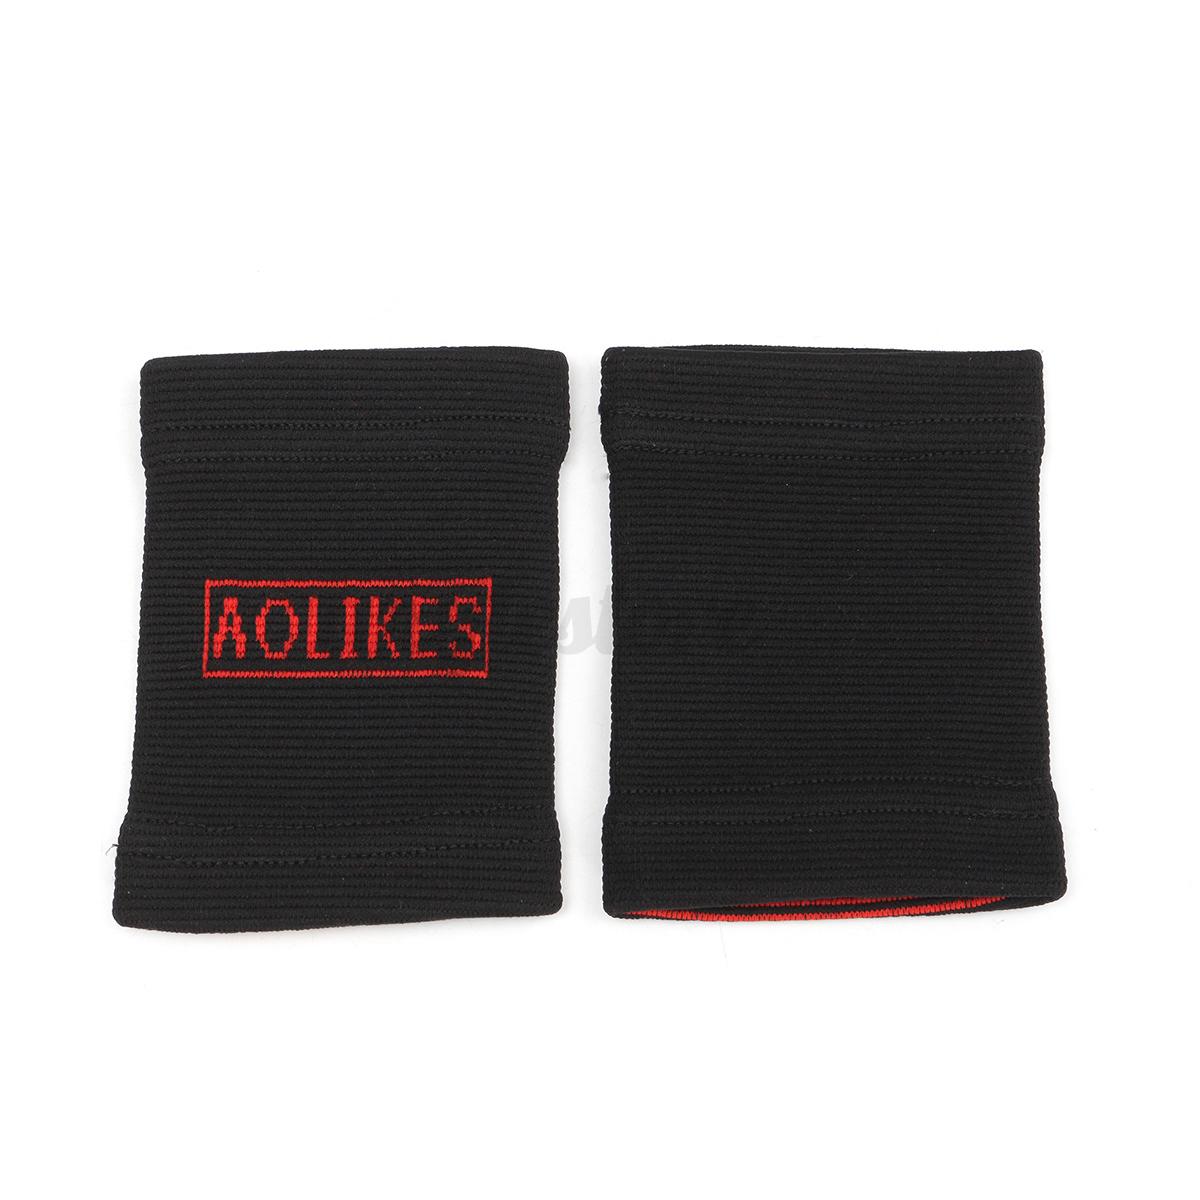 1 Pair Nylon Elastic Wrist Support Brace Strap Band Protector Injury Sport Gym 10